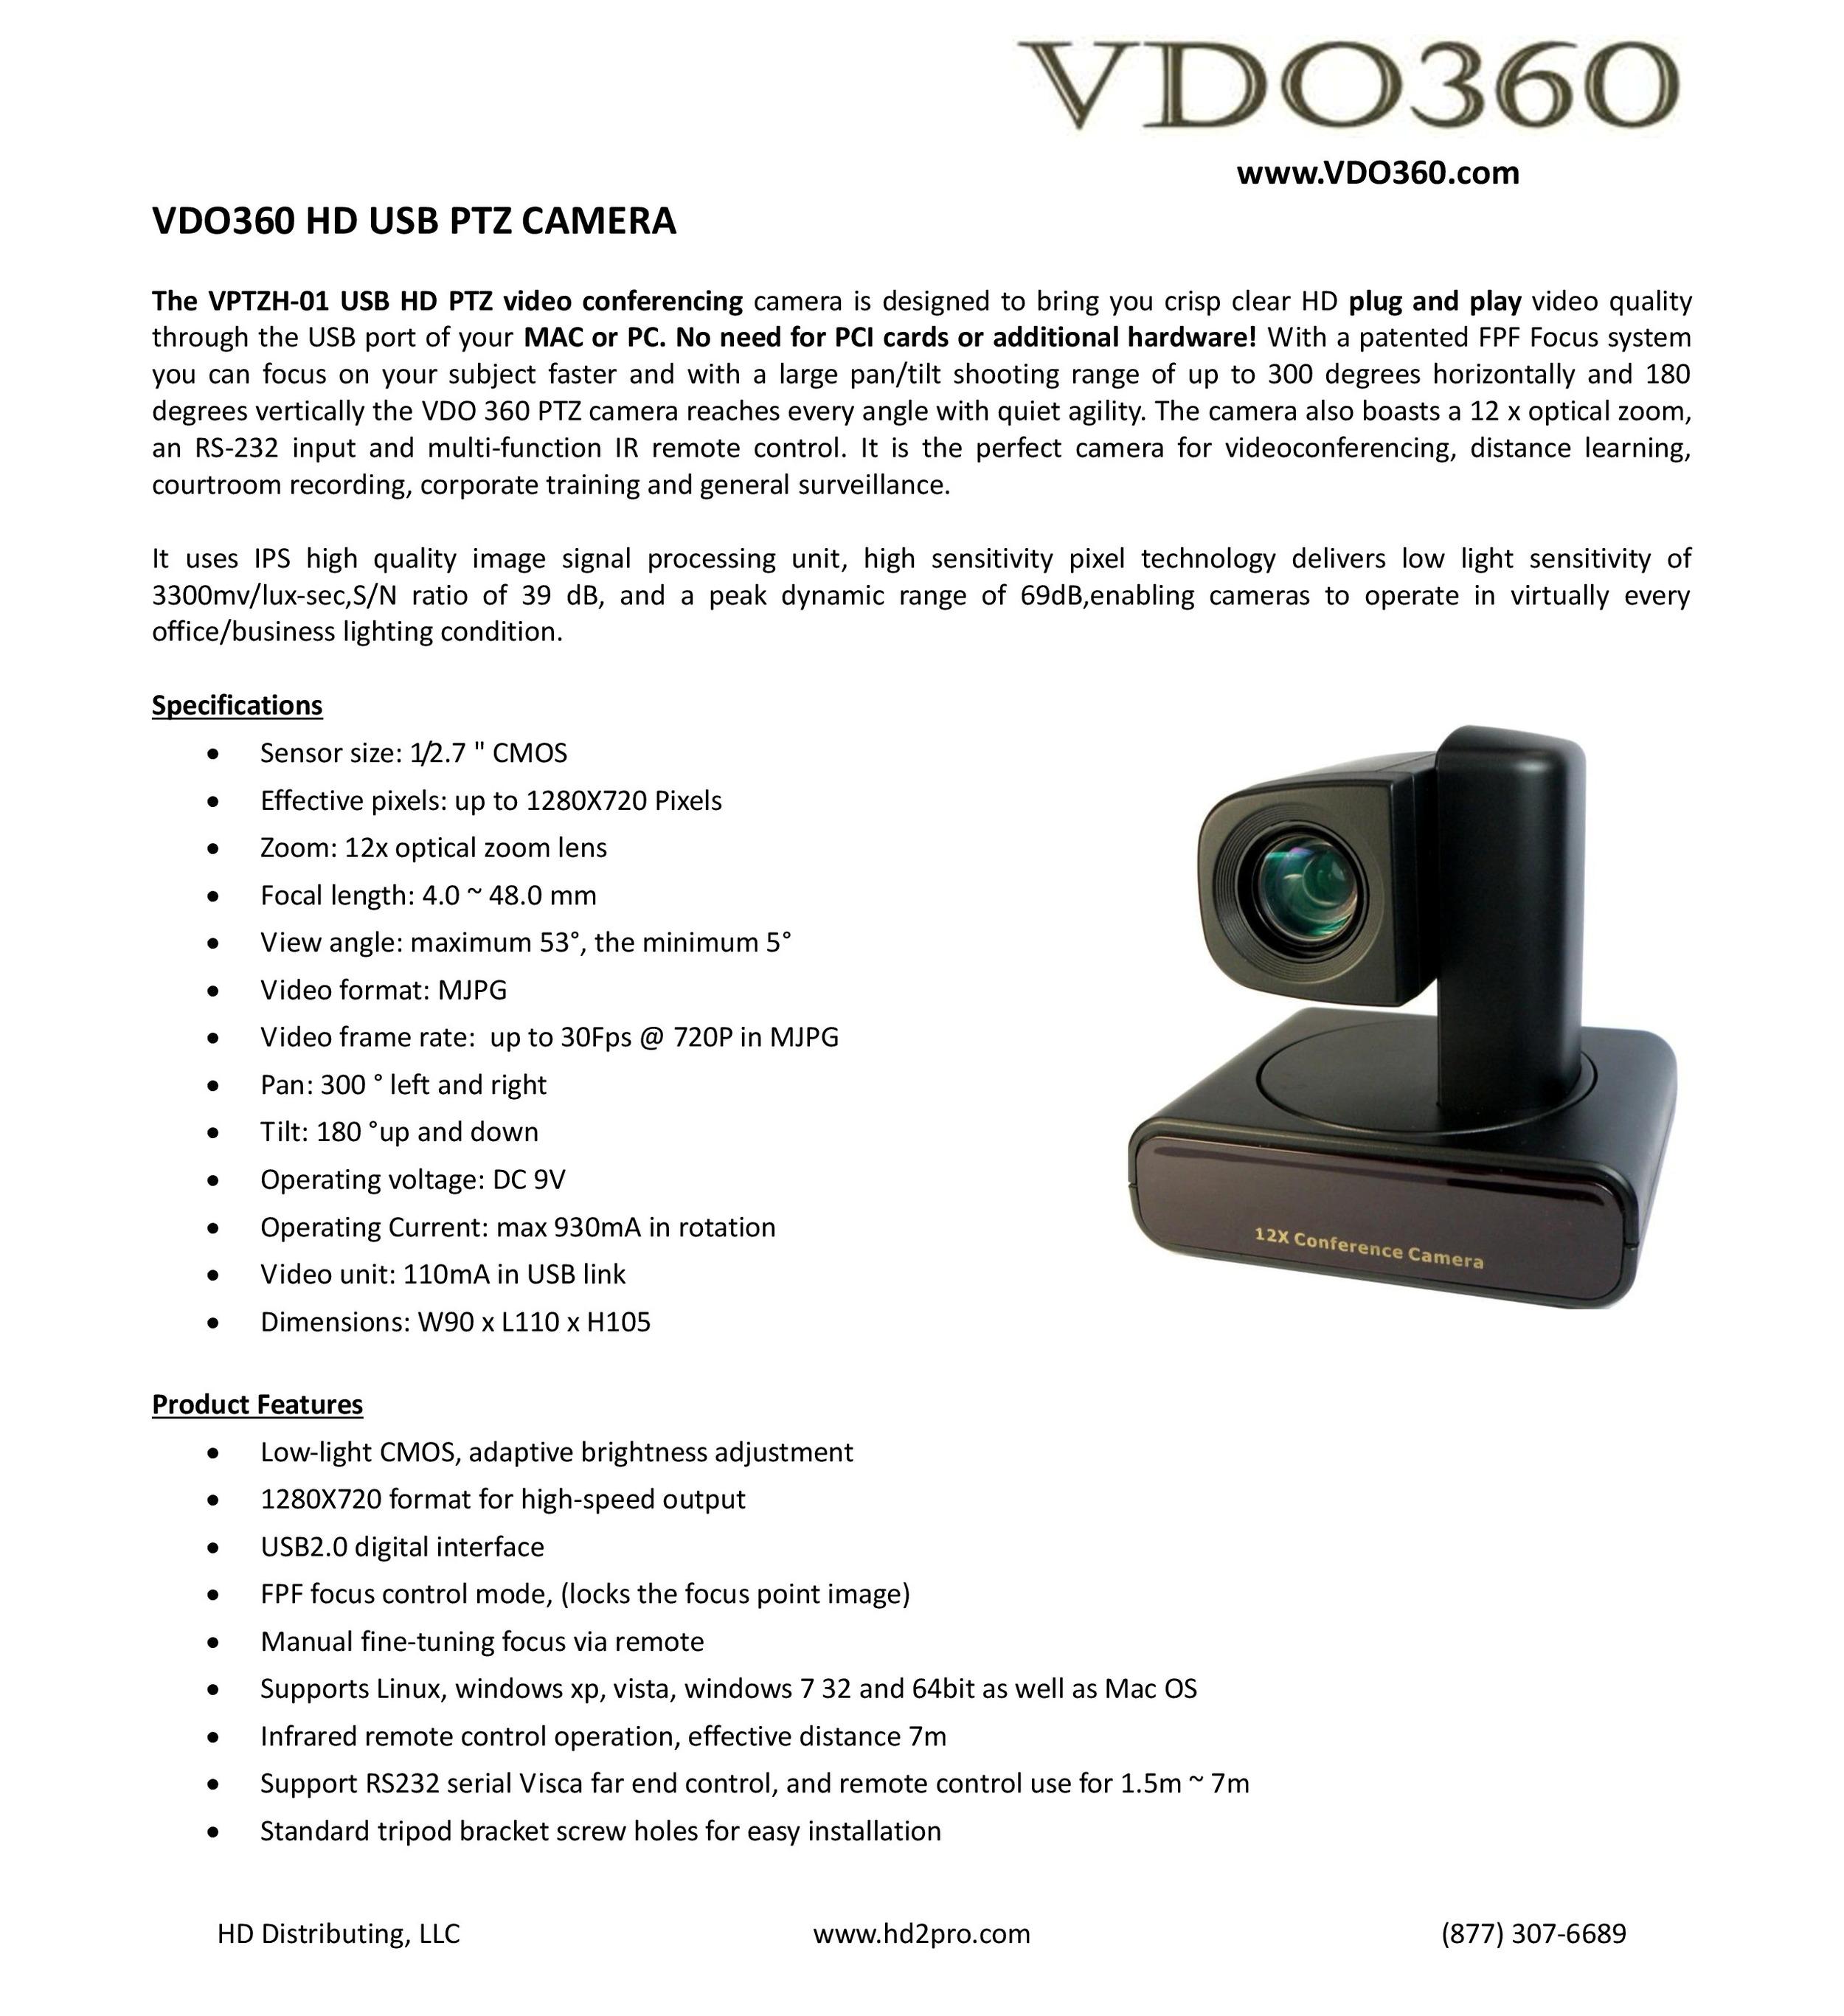 vdo360 usb ptz camera